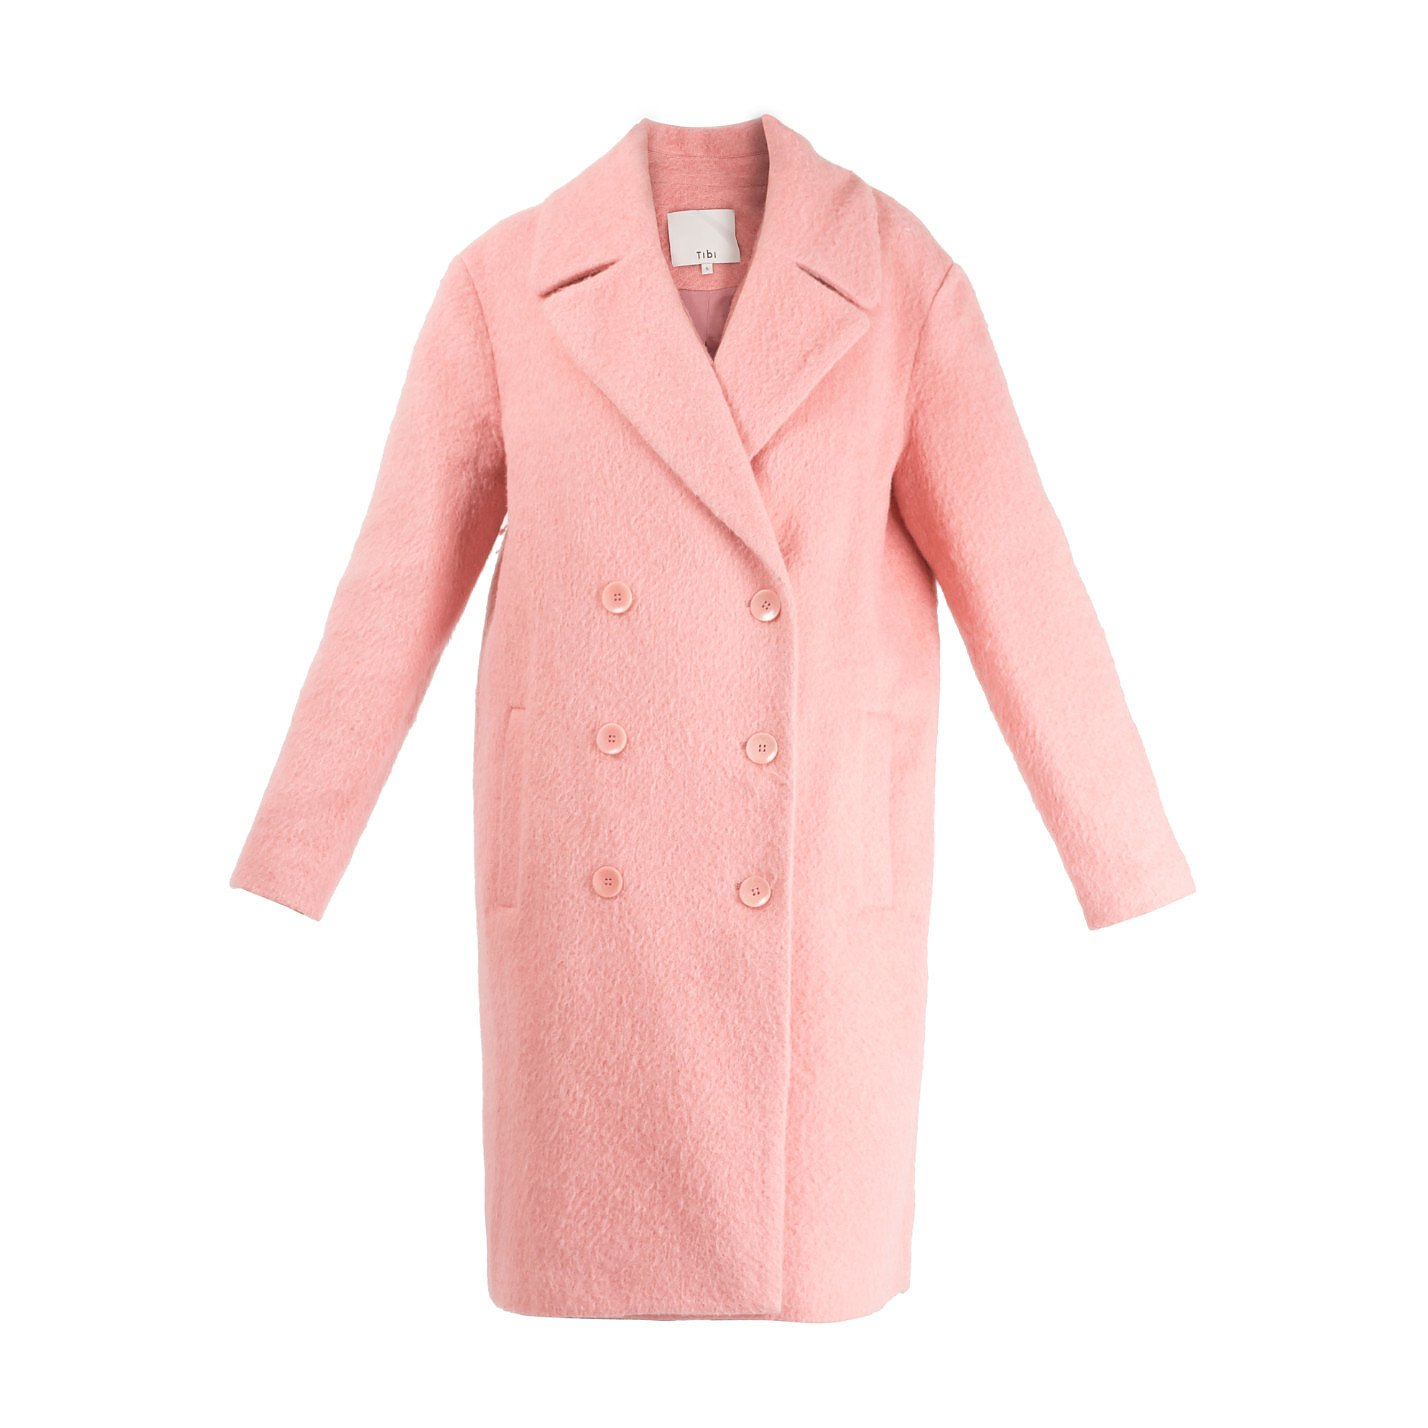 Tibi Mohair Blend Coat